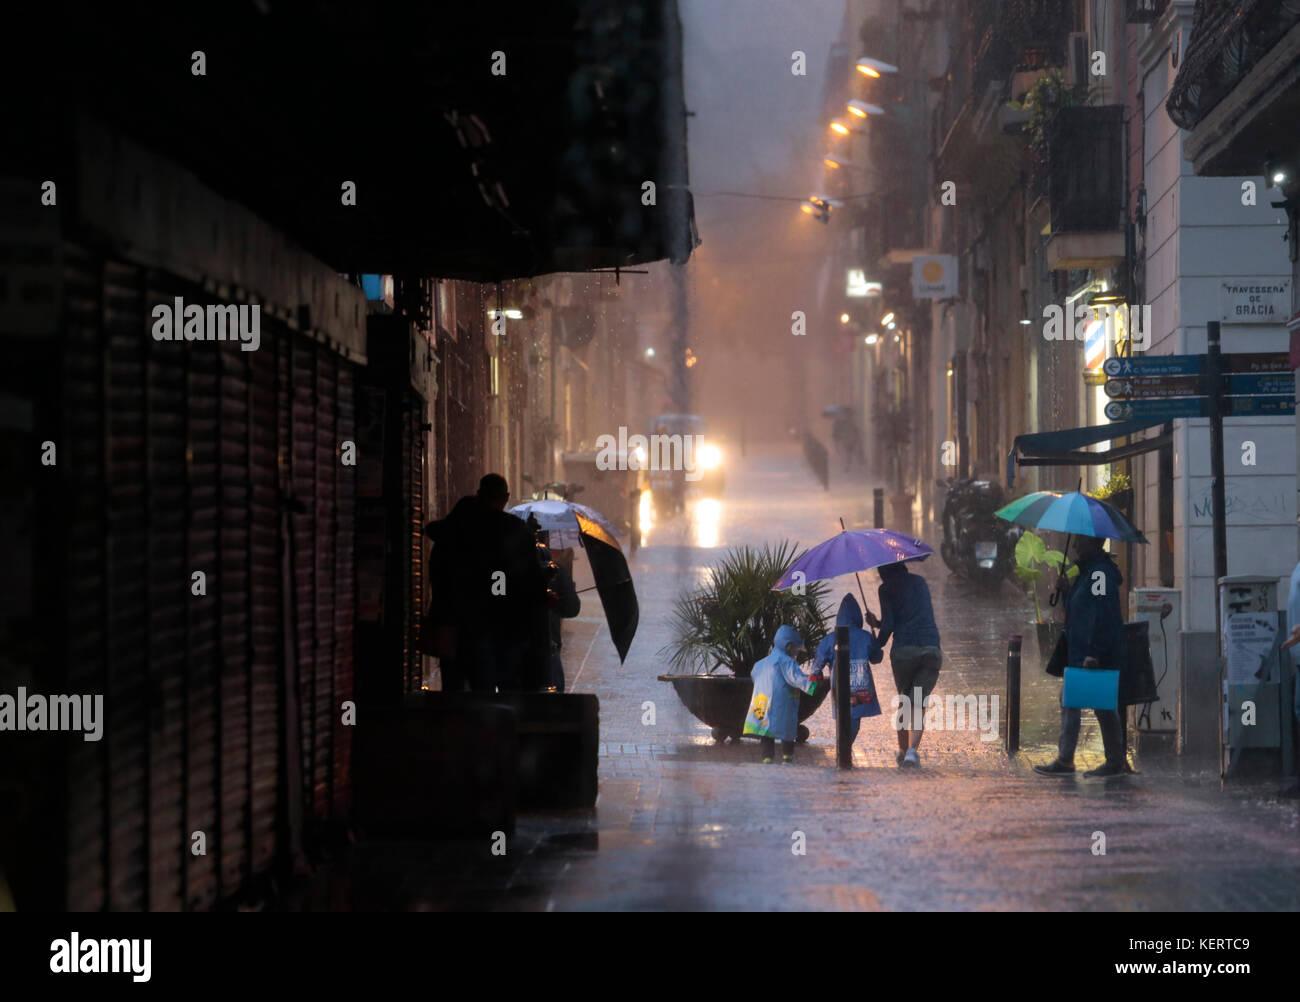 Rain Storm Street Stock Photos Amp Rain Storm Street Stock